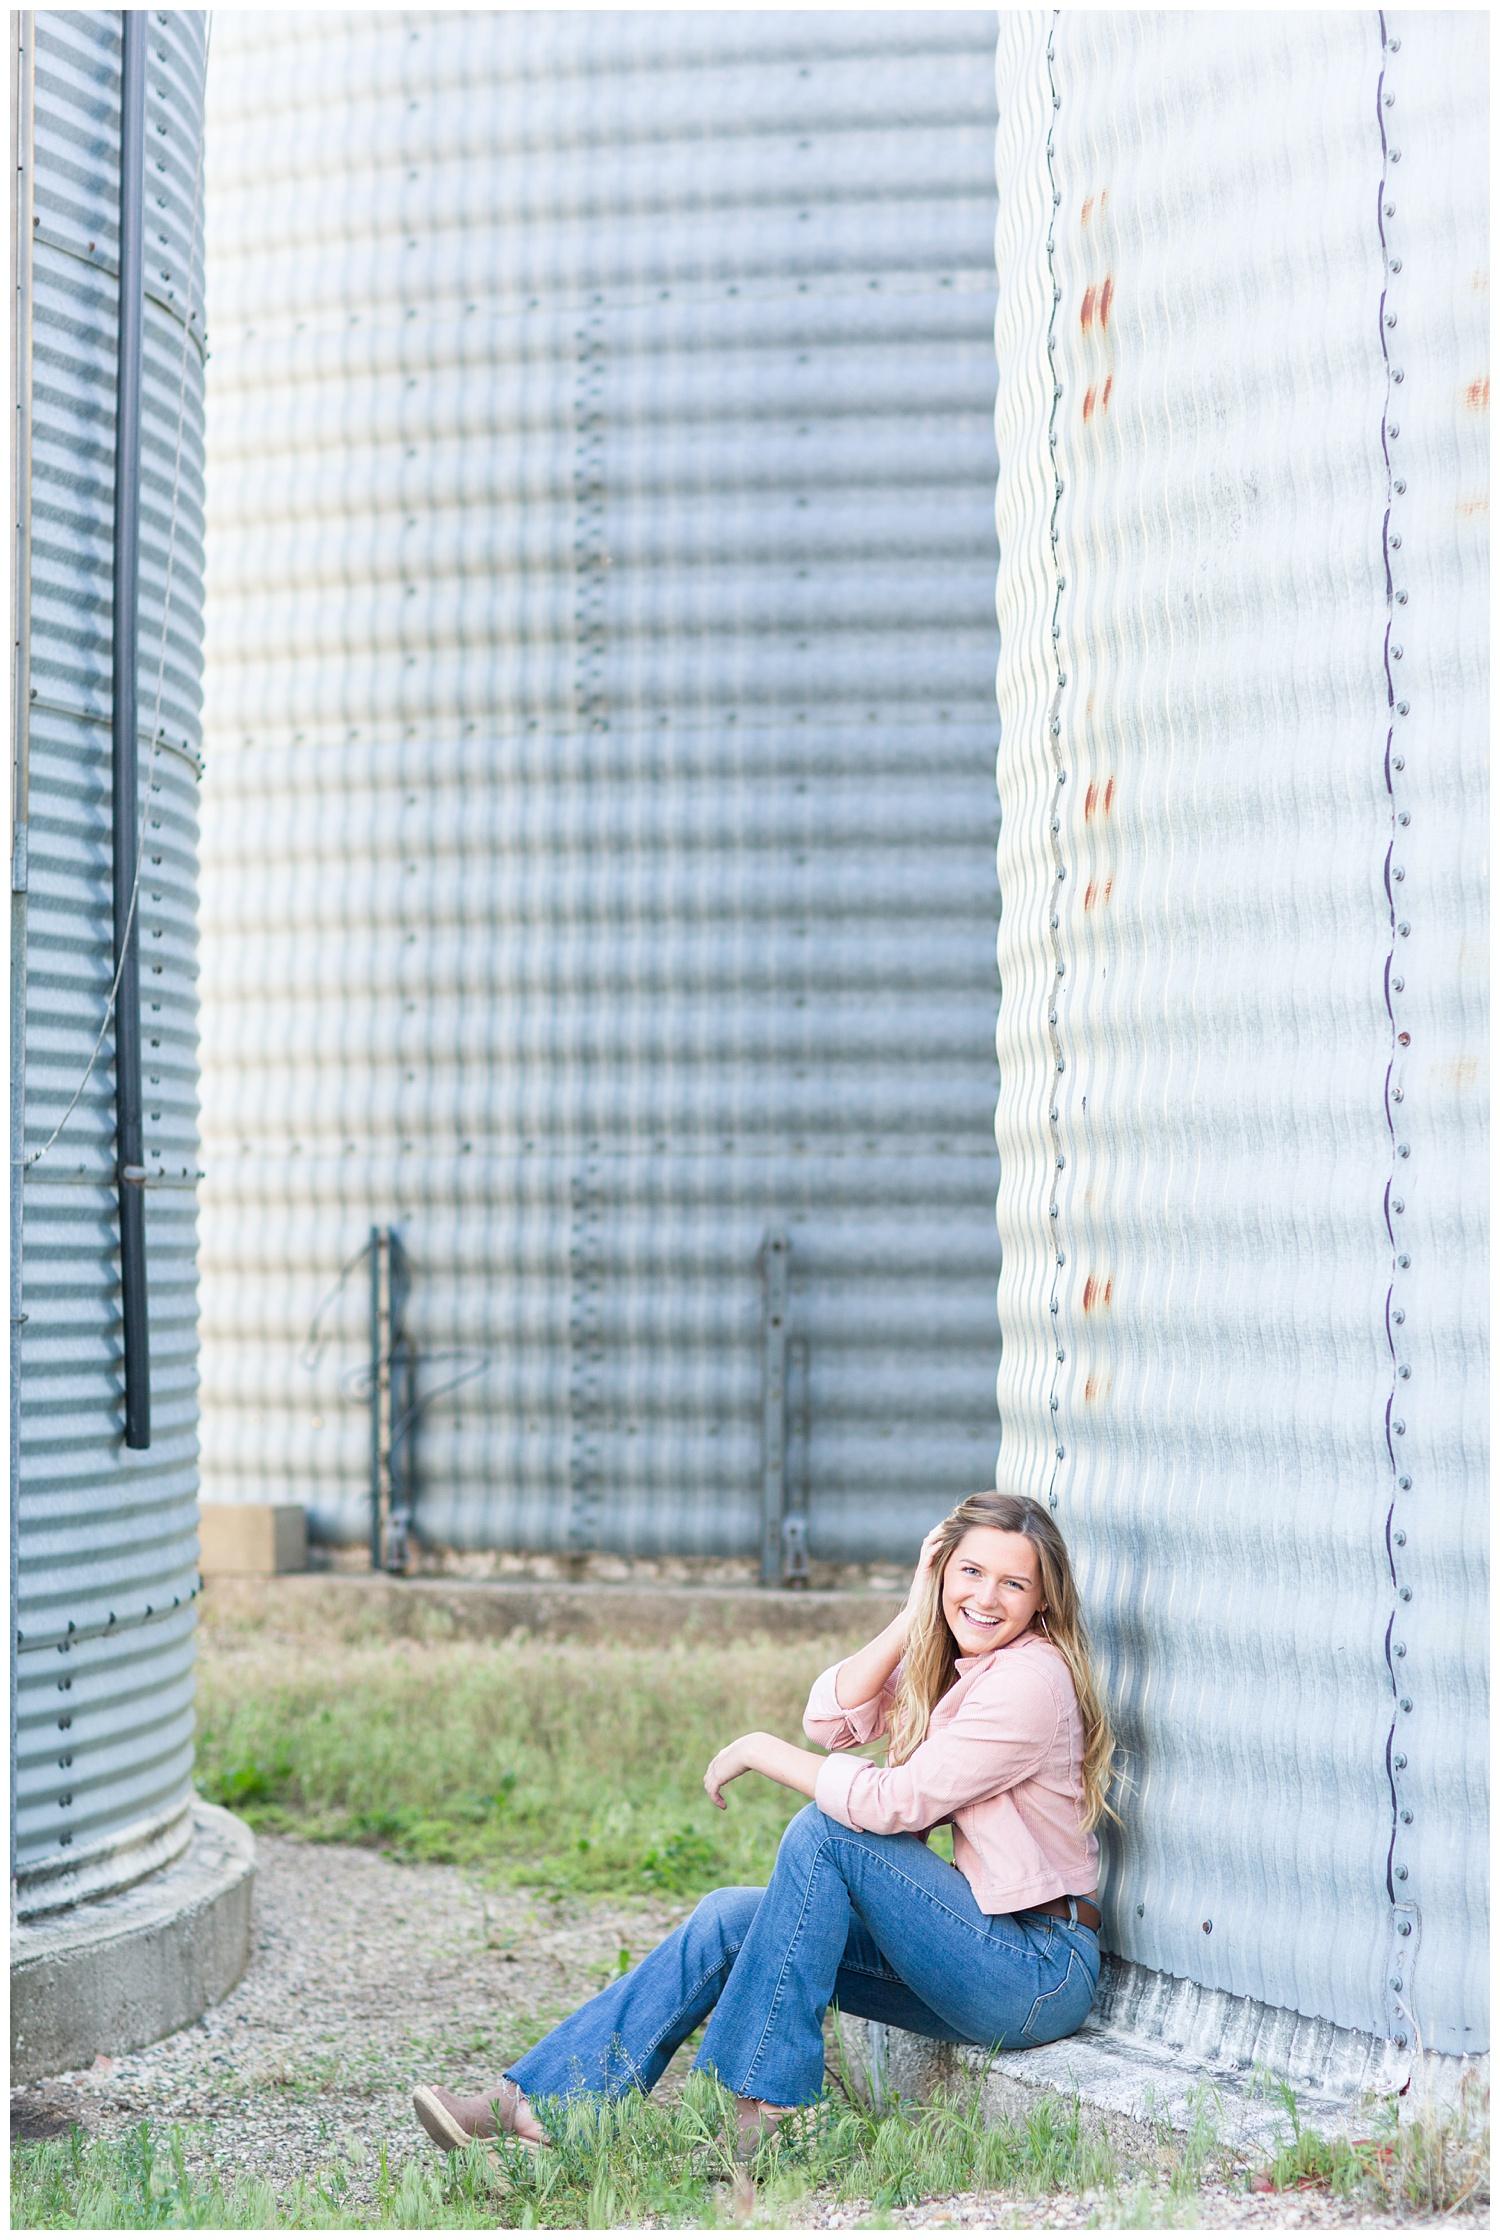 Senior girl sitting next to a grain bin in rural north central Iowa | CB Studio